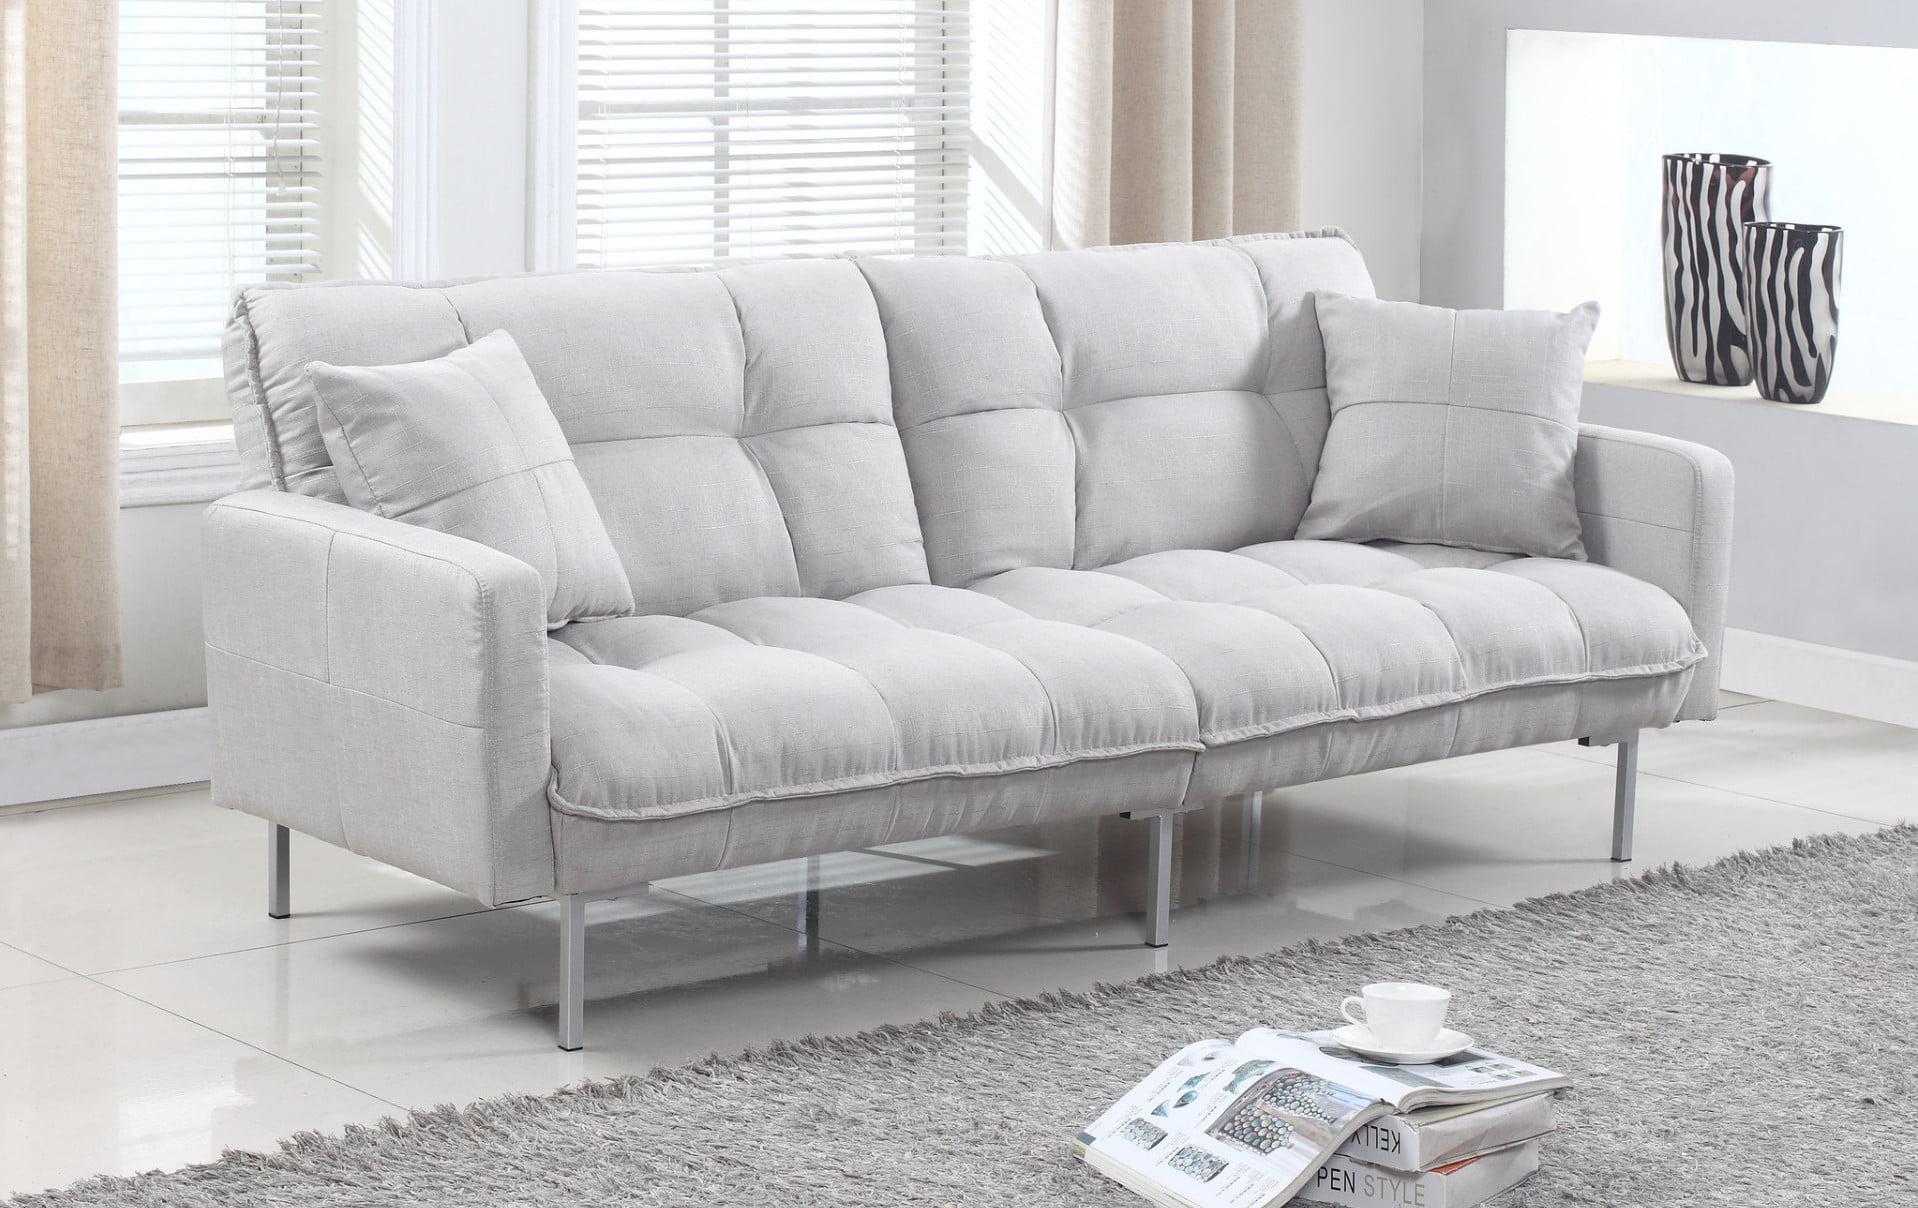 Modern Plush Tufted Linen Fabric Splitback Living Room Sleeper Futon Com